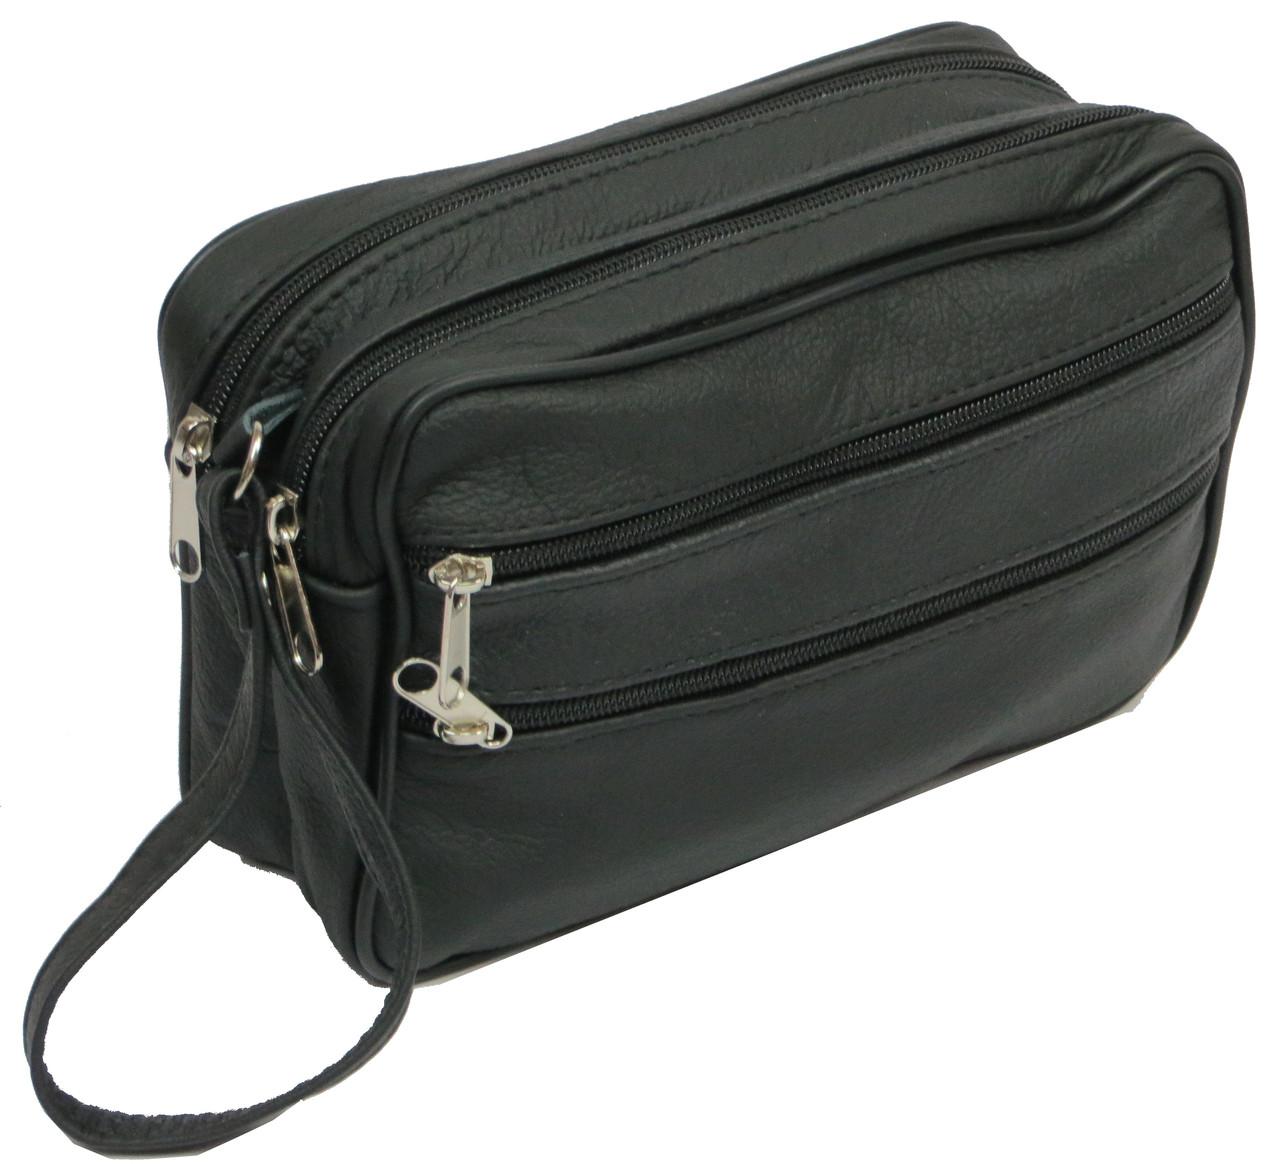 Мужская кожаная сумка, барсетка 41393 Andrzej черная